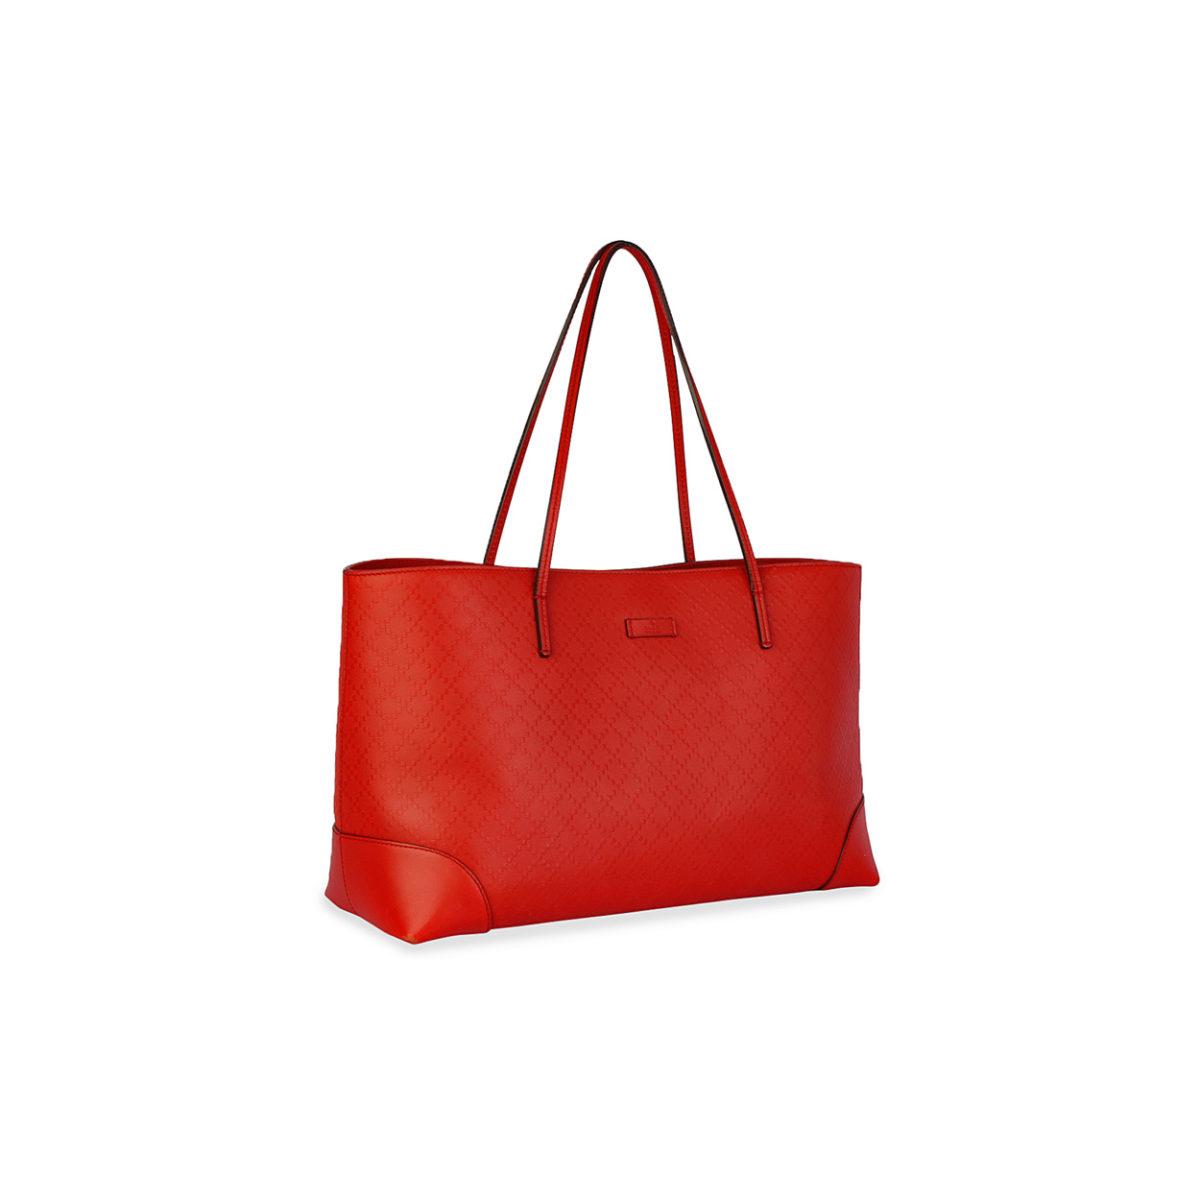 022401900017 GUCCI Bright Diamante Leather Tote Red   Luxity